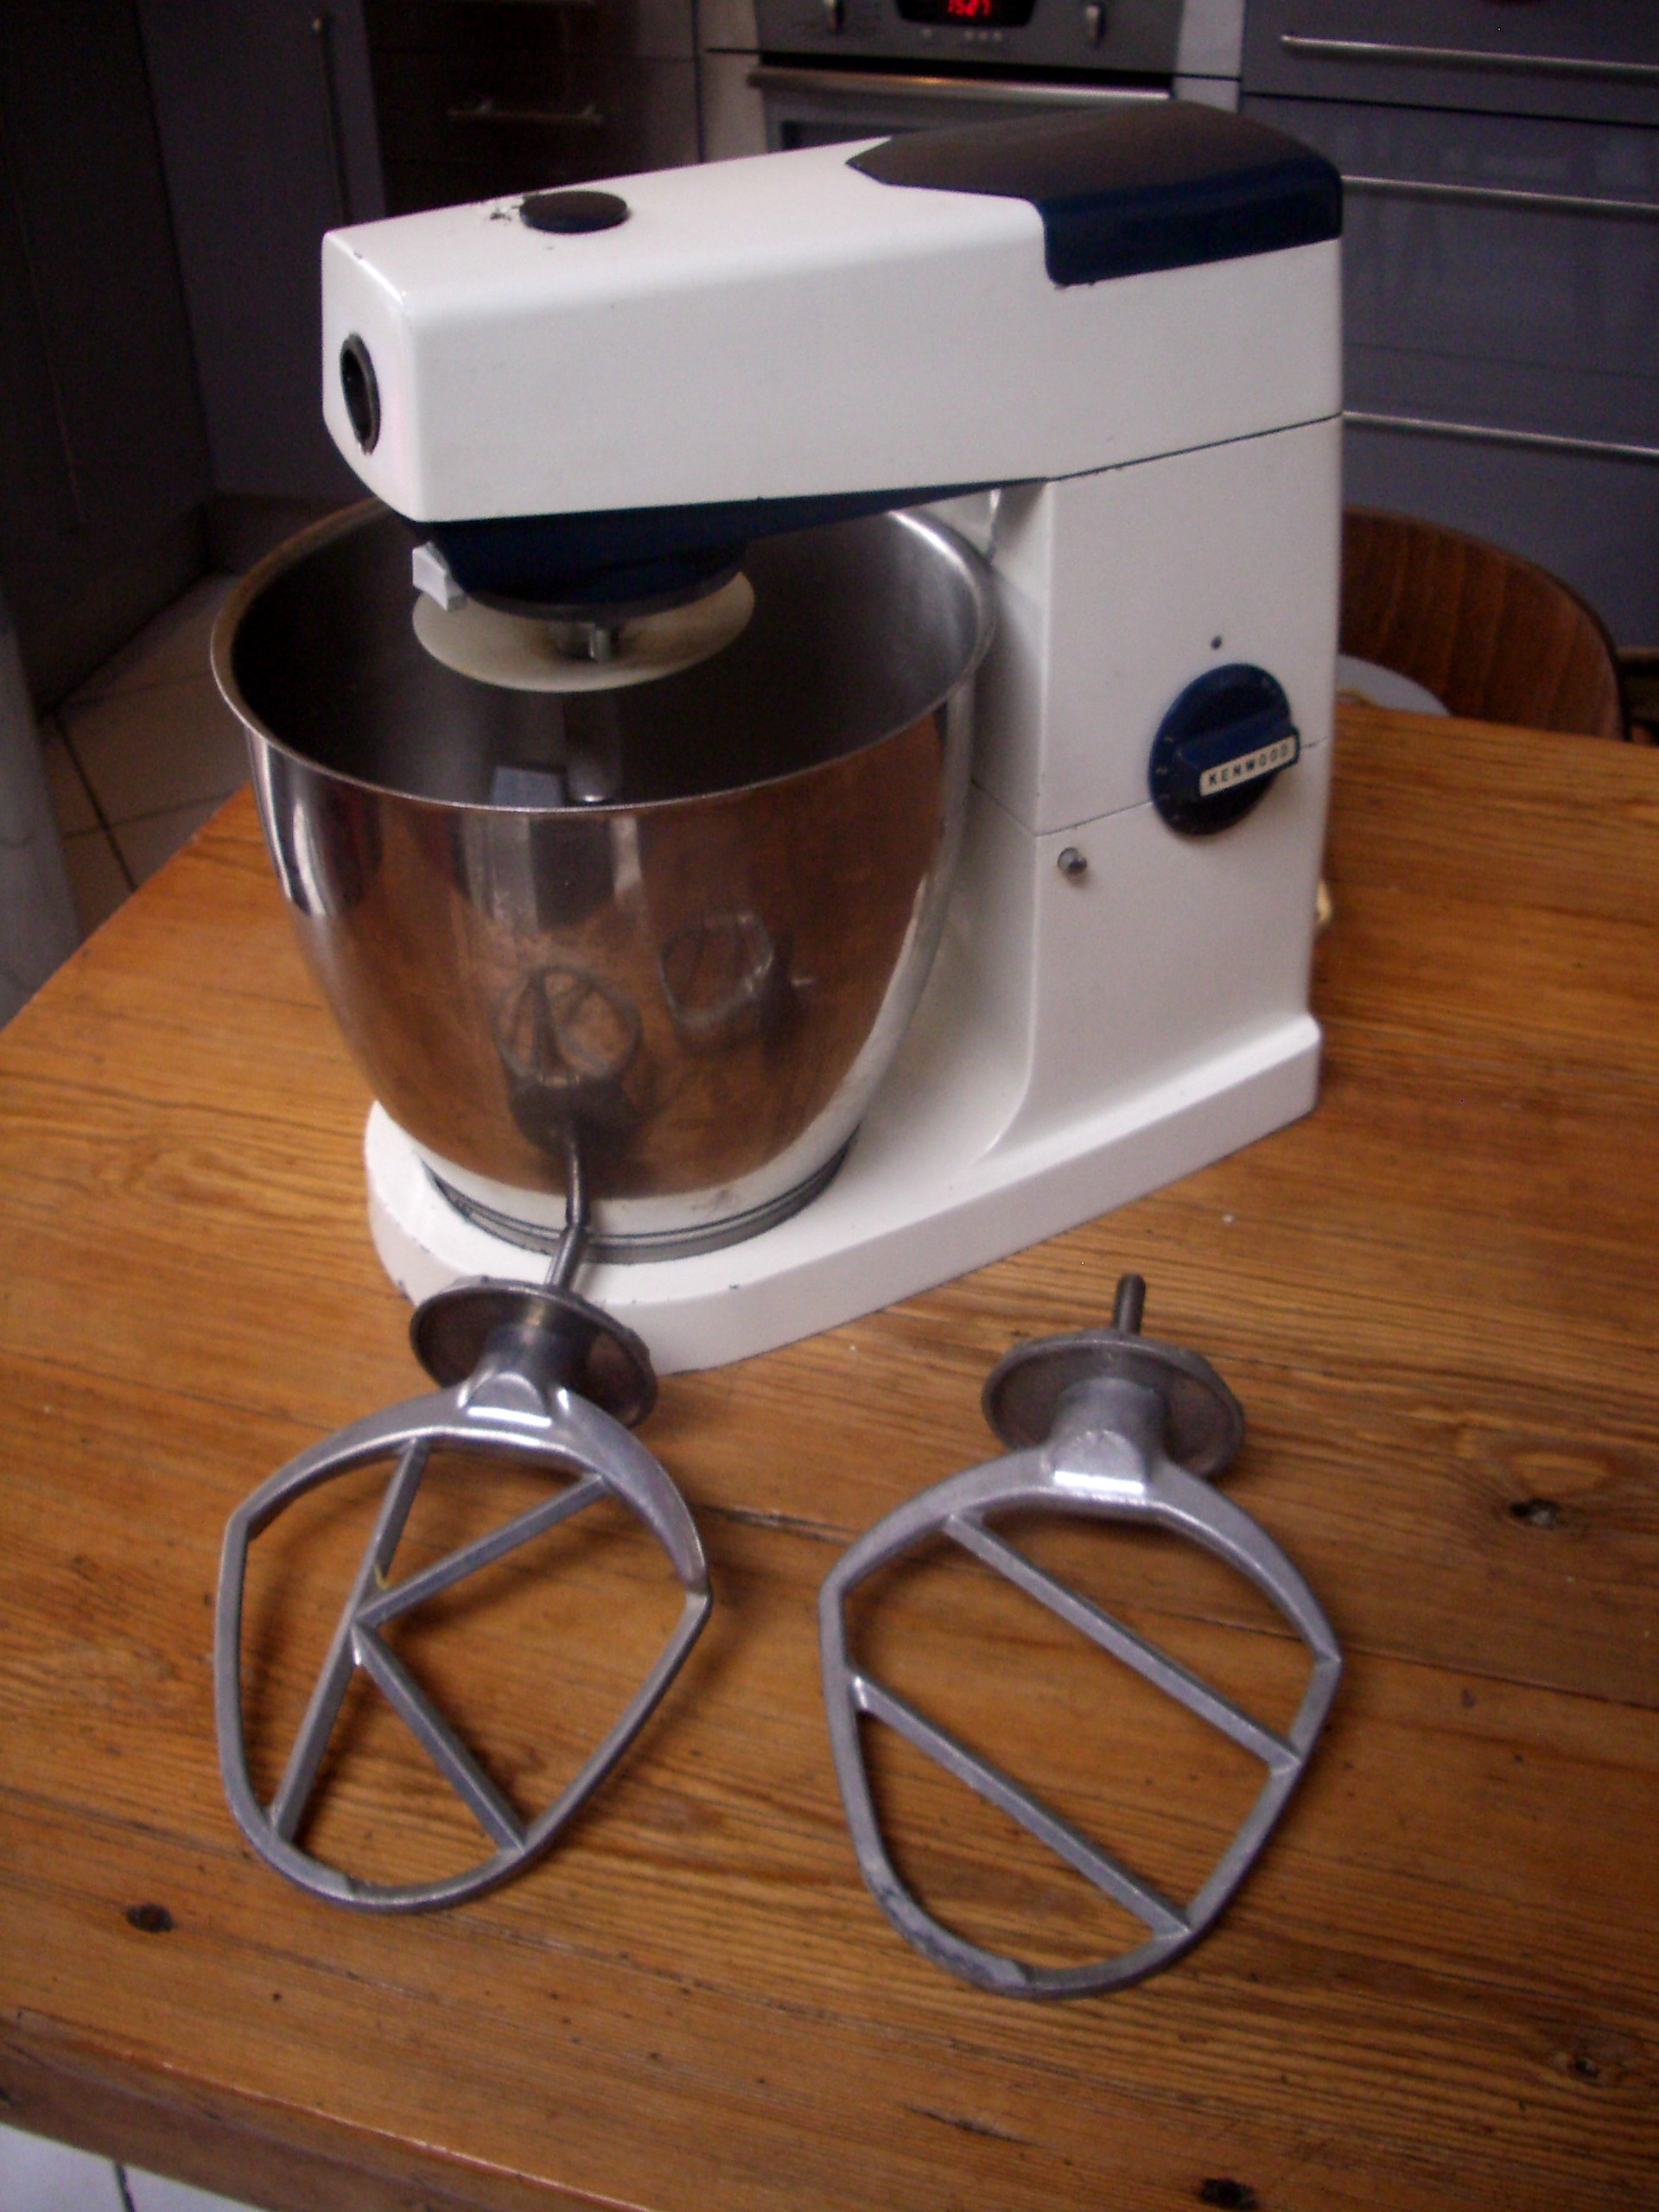 robot petrin cuisine kenwood chef a707a mixer vintage bol inox. Black Bedroom Furniture Sets. Home Design Ideas